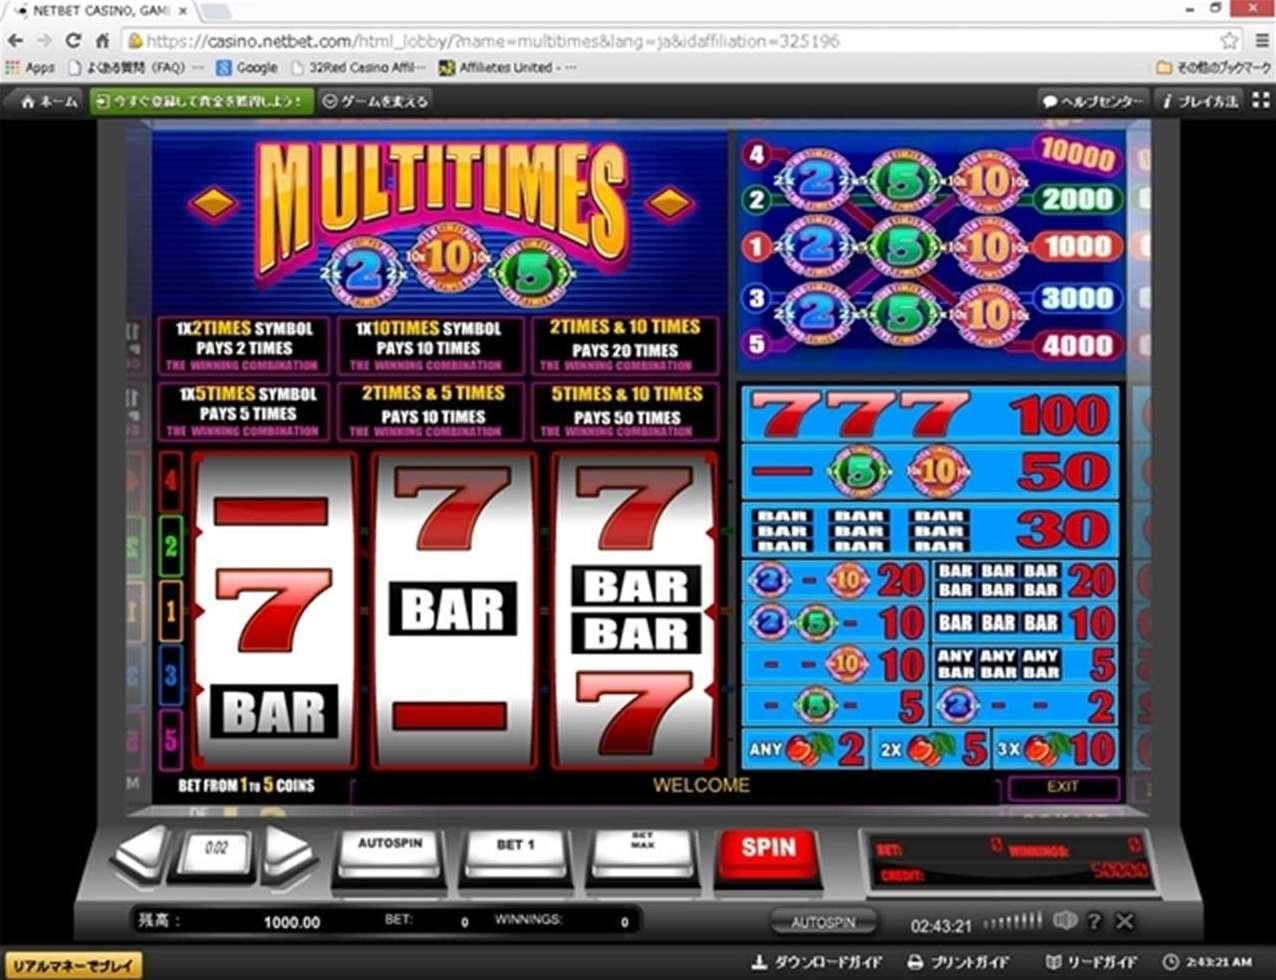 Multitimes